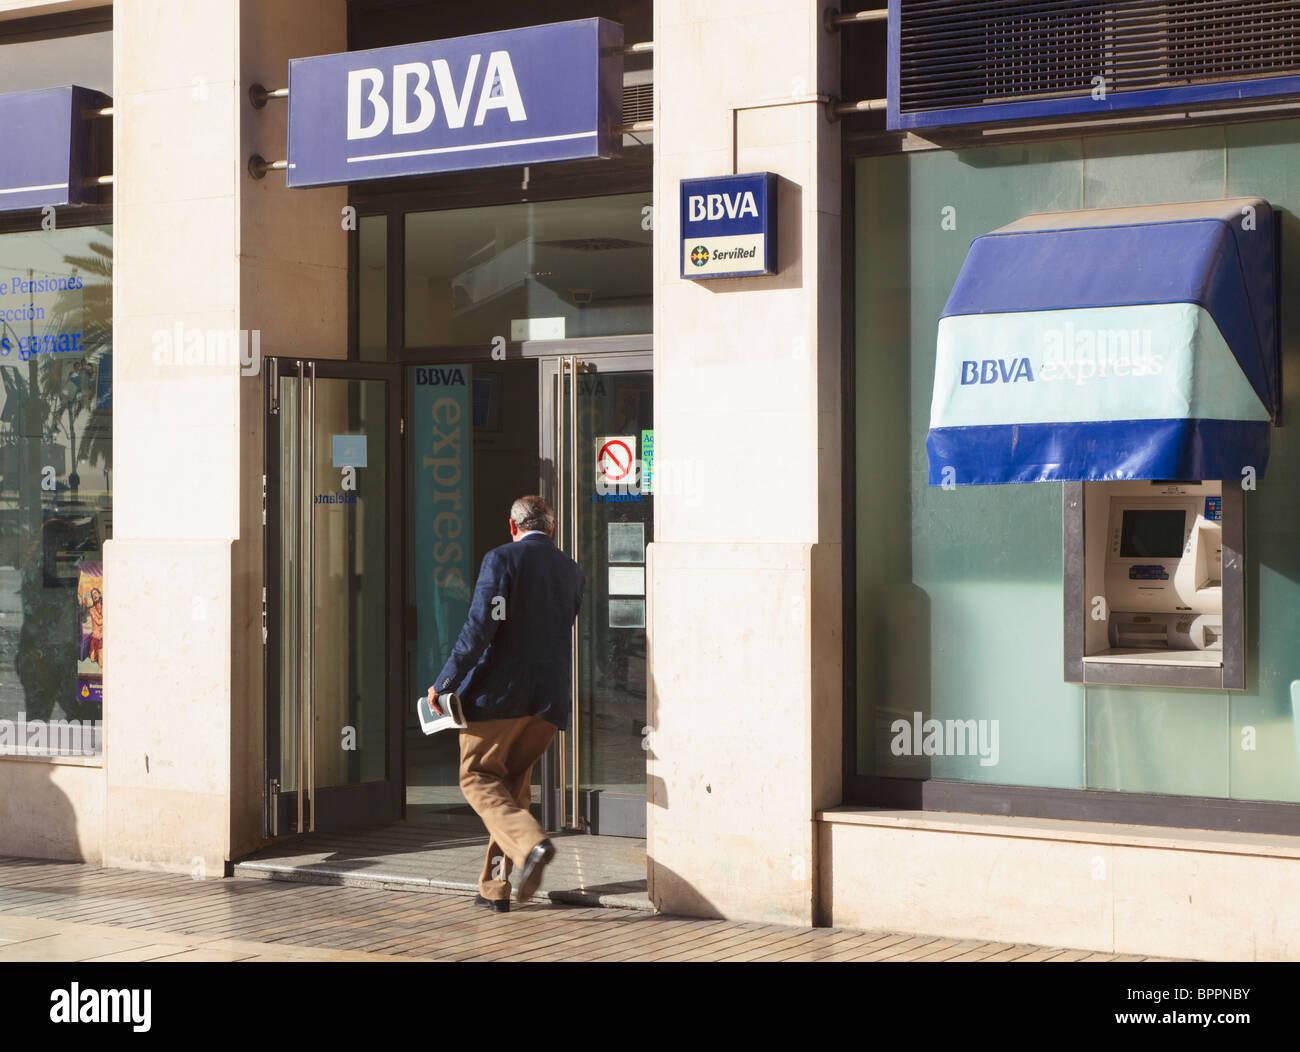 Branch of the BBVA bank in Malaga, Malaga Province, Spain. - Stock Image